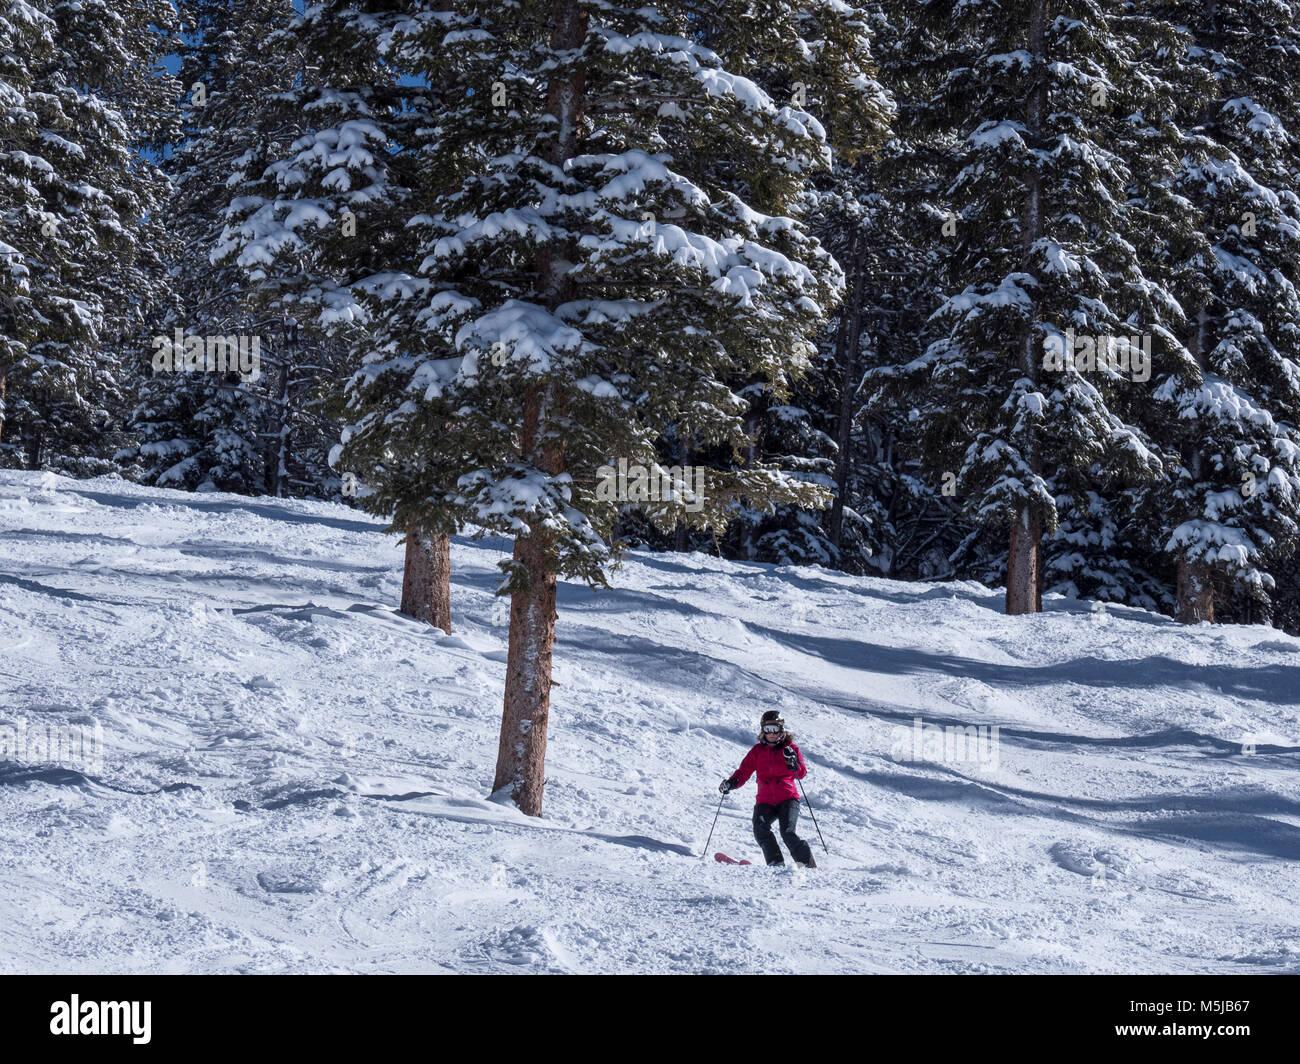 Le skieur skis Star Trail, hiver, Blue Sky Basin, Station de Ski de Vail, Vail, Colorado. Photo Stock